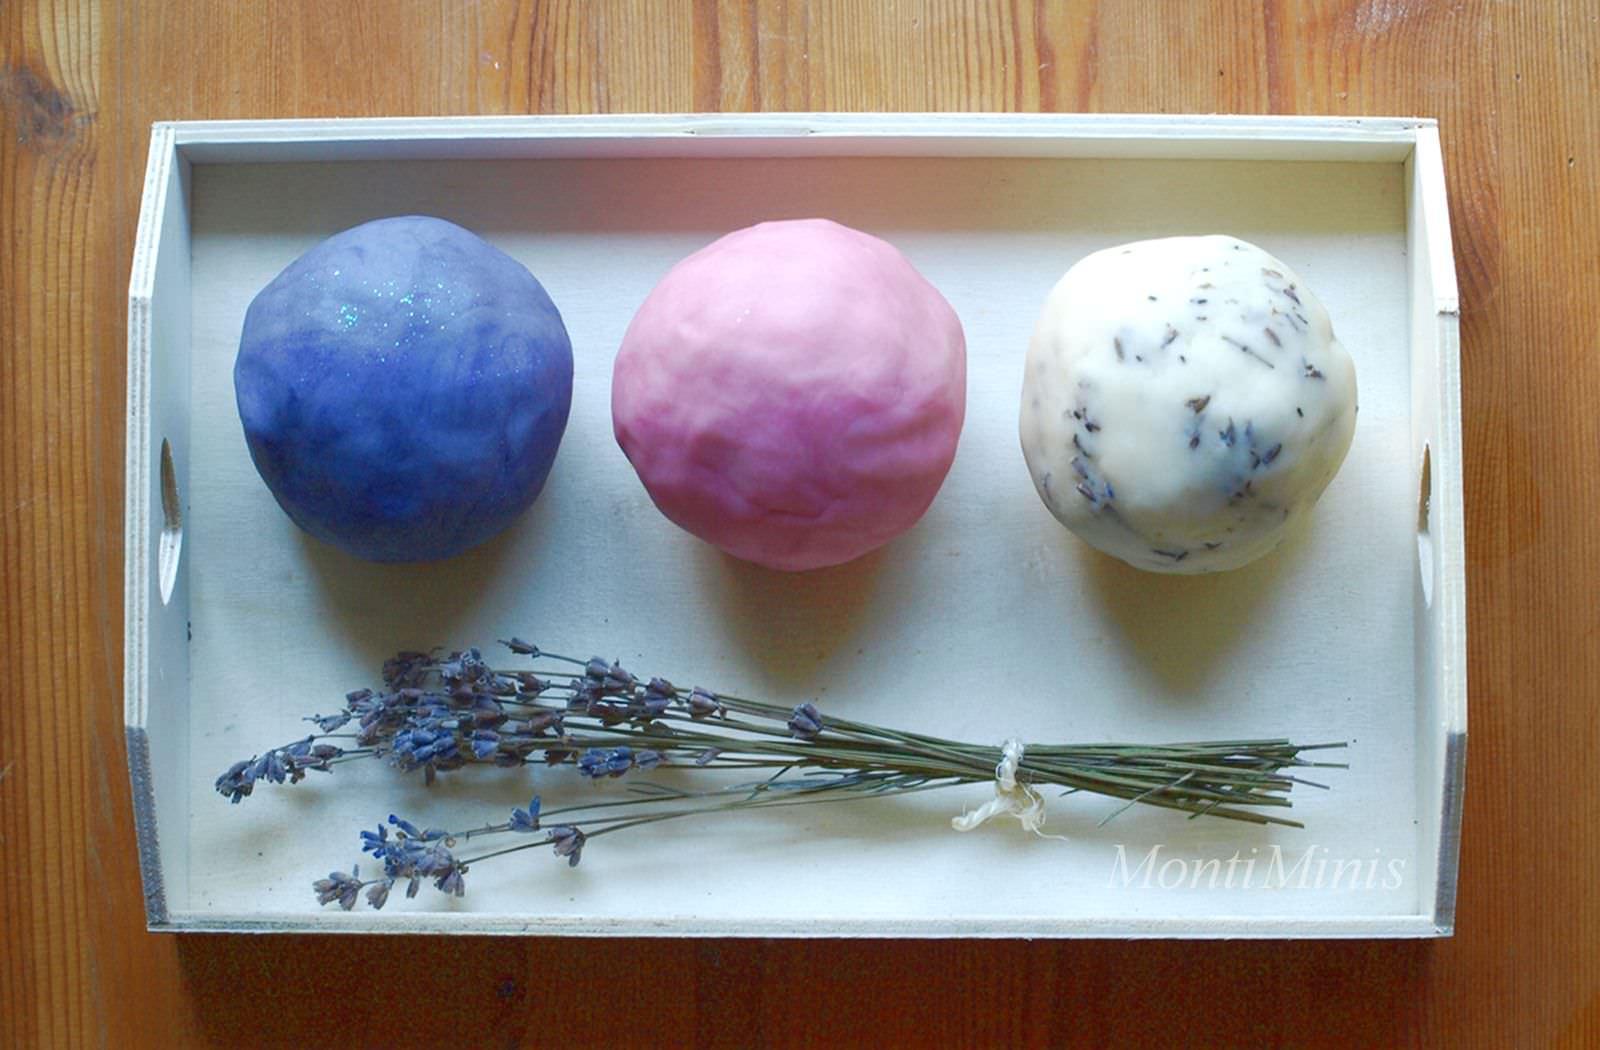 lila lavendel themenwoche montiminis. Black Bedroom Furniture Sets. Home Design Ideas